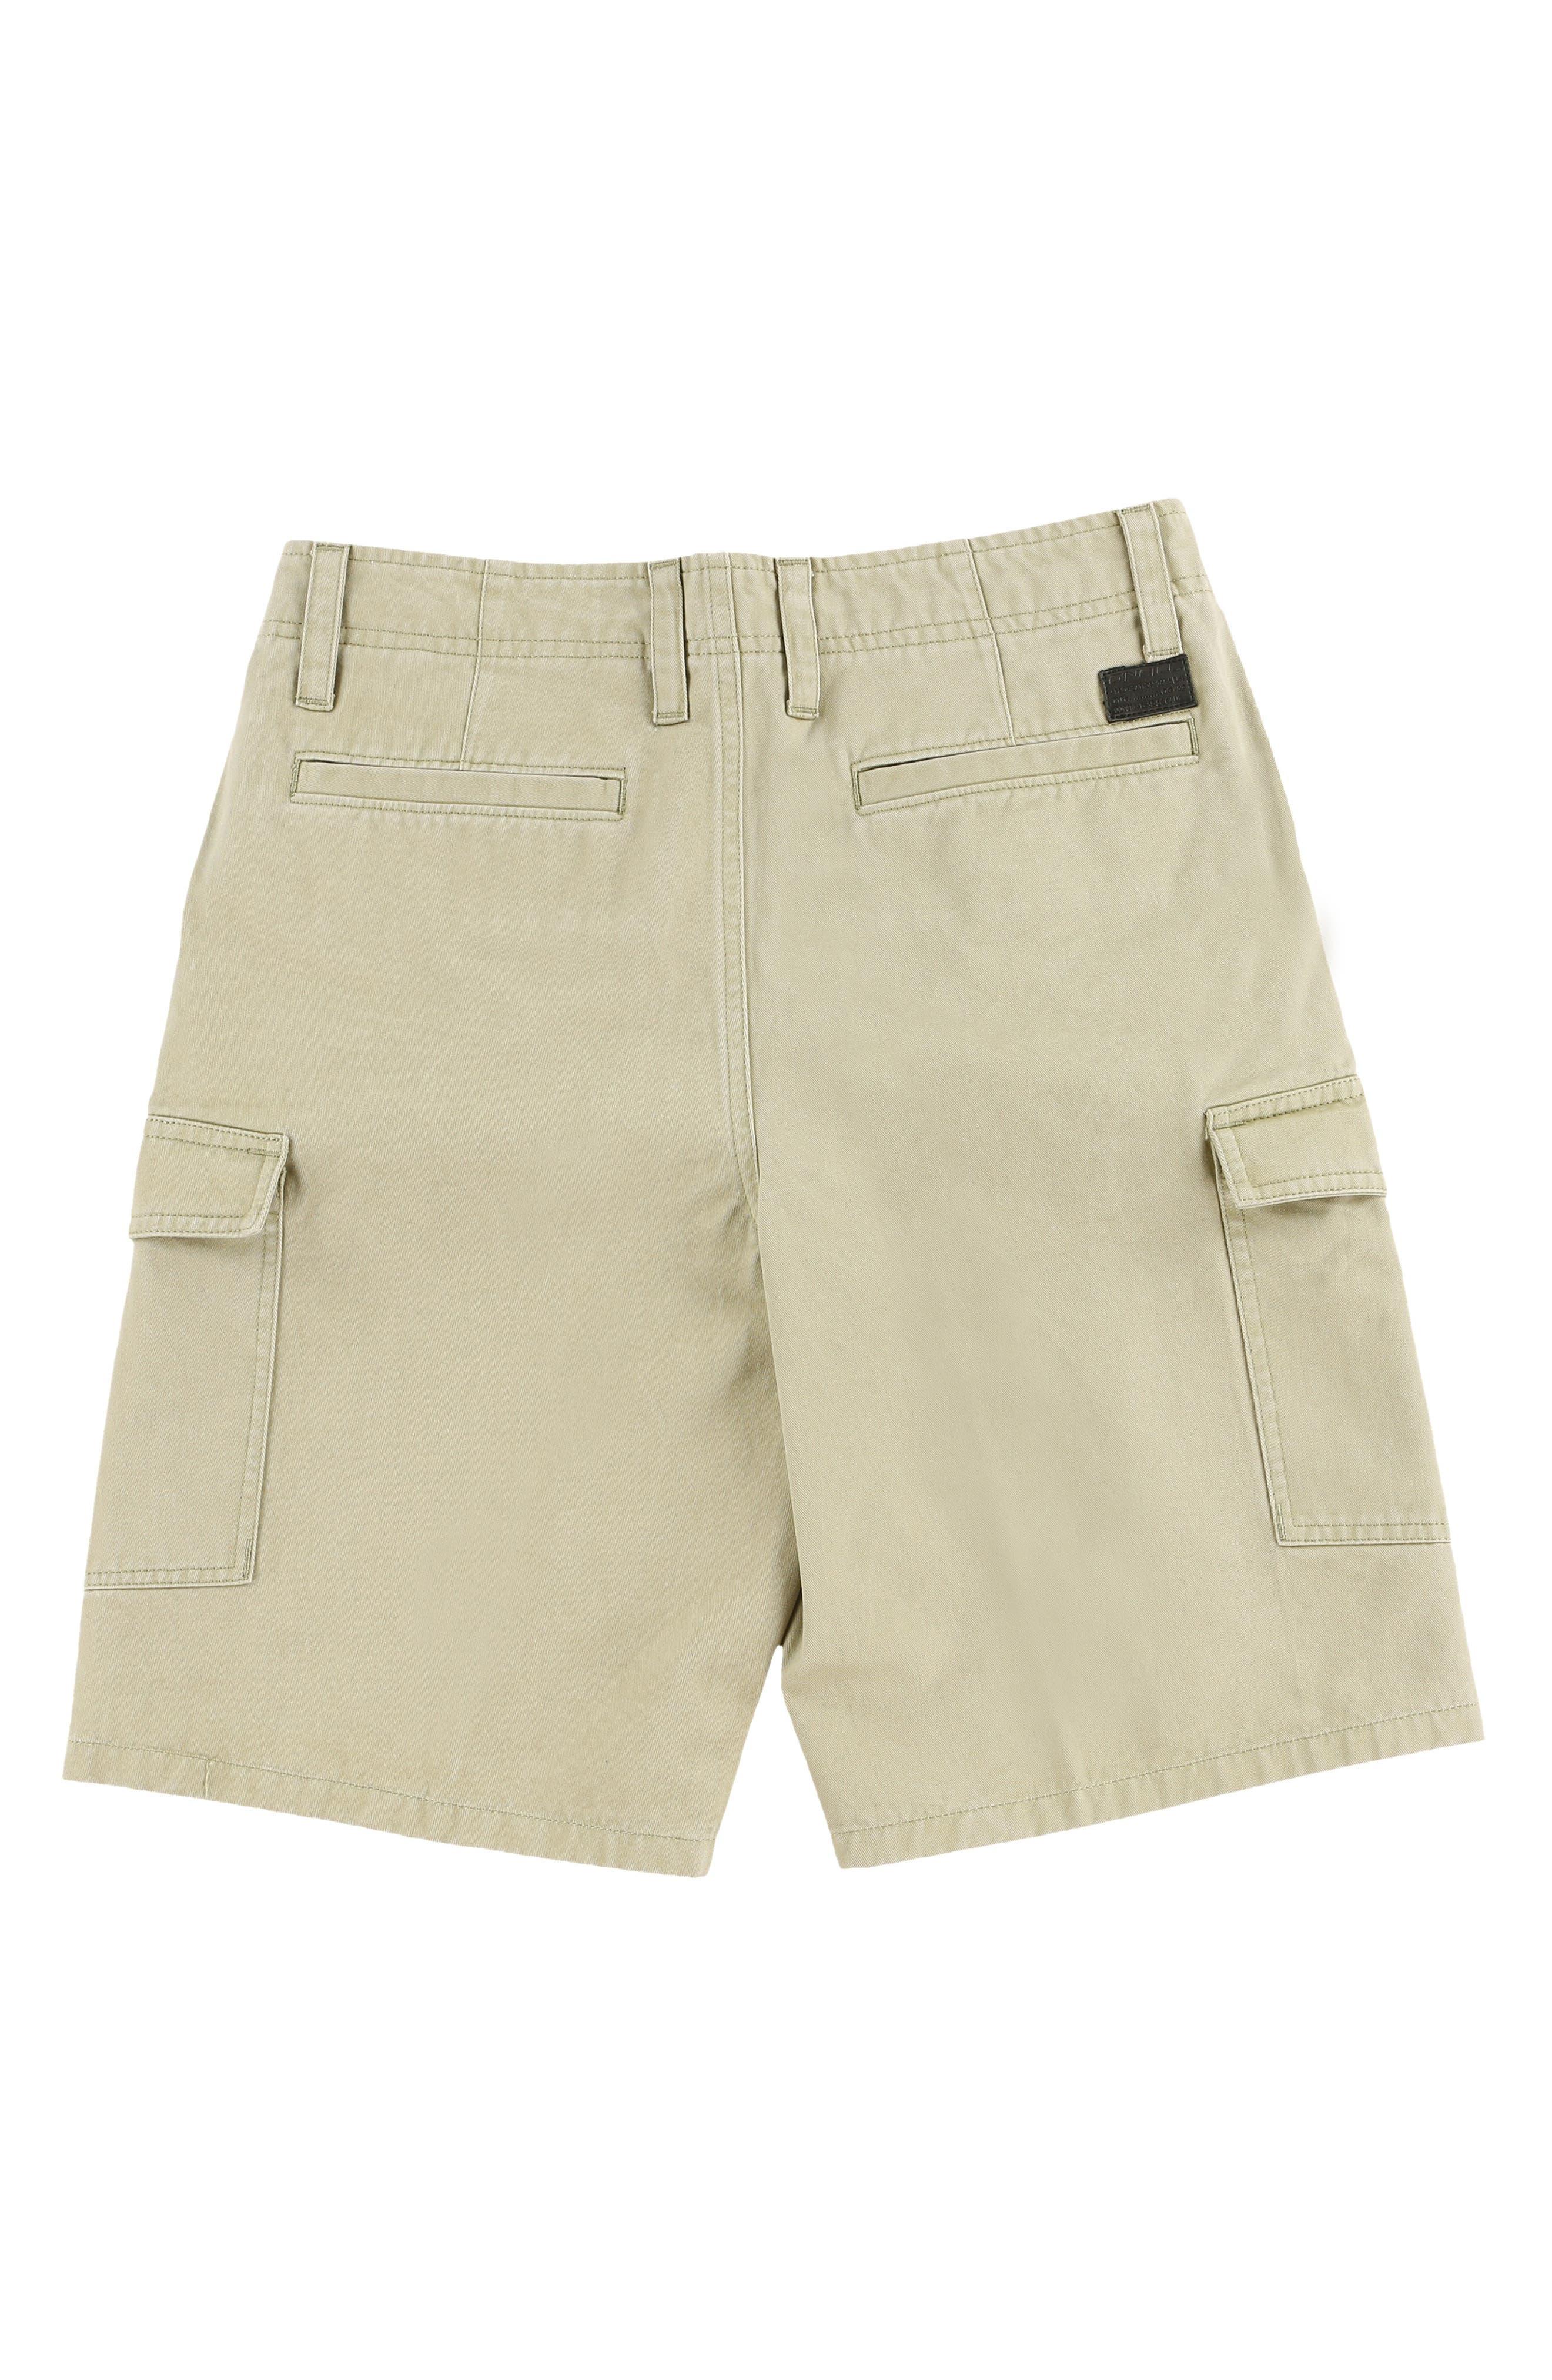 Johnny Cargo Shorts,                             Alternate thumbnail 2, color,                             251